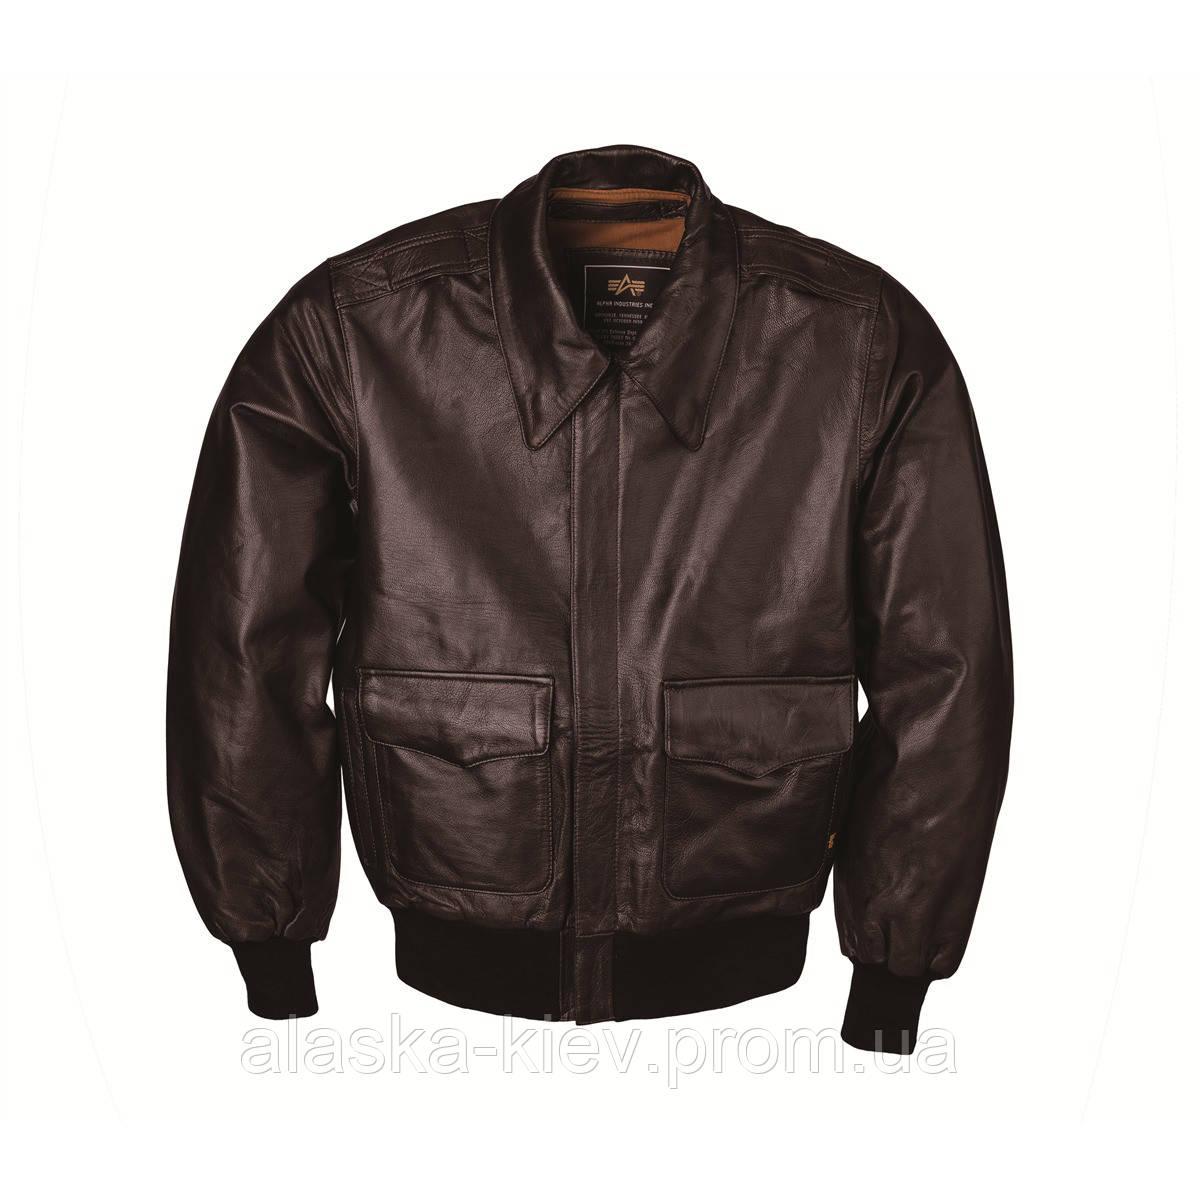 04621f2dda86 Кожаная Куртка A-2 Leather Jacket. Alpha Industries — в Категории